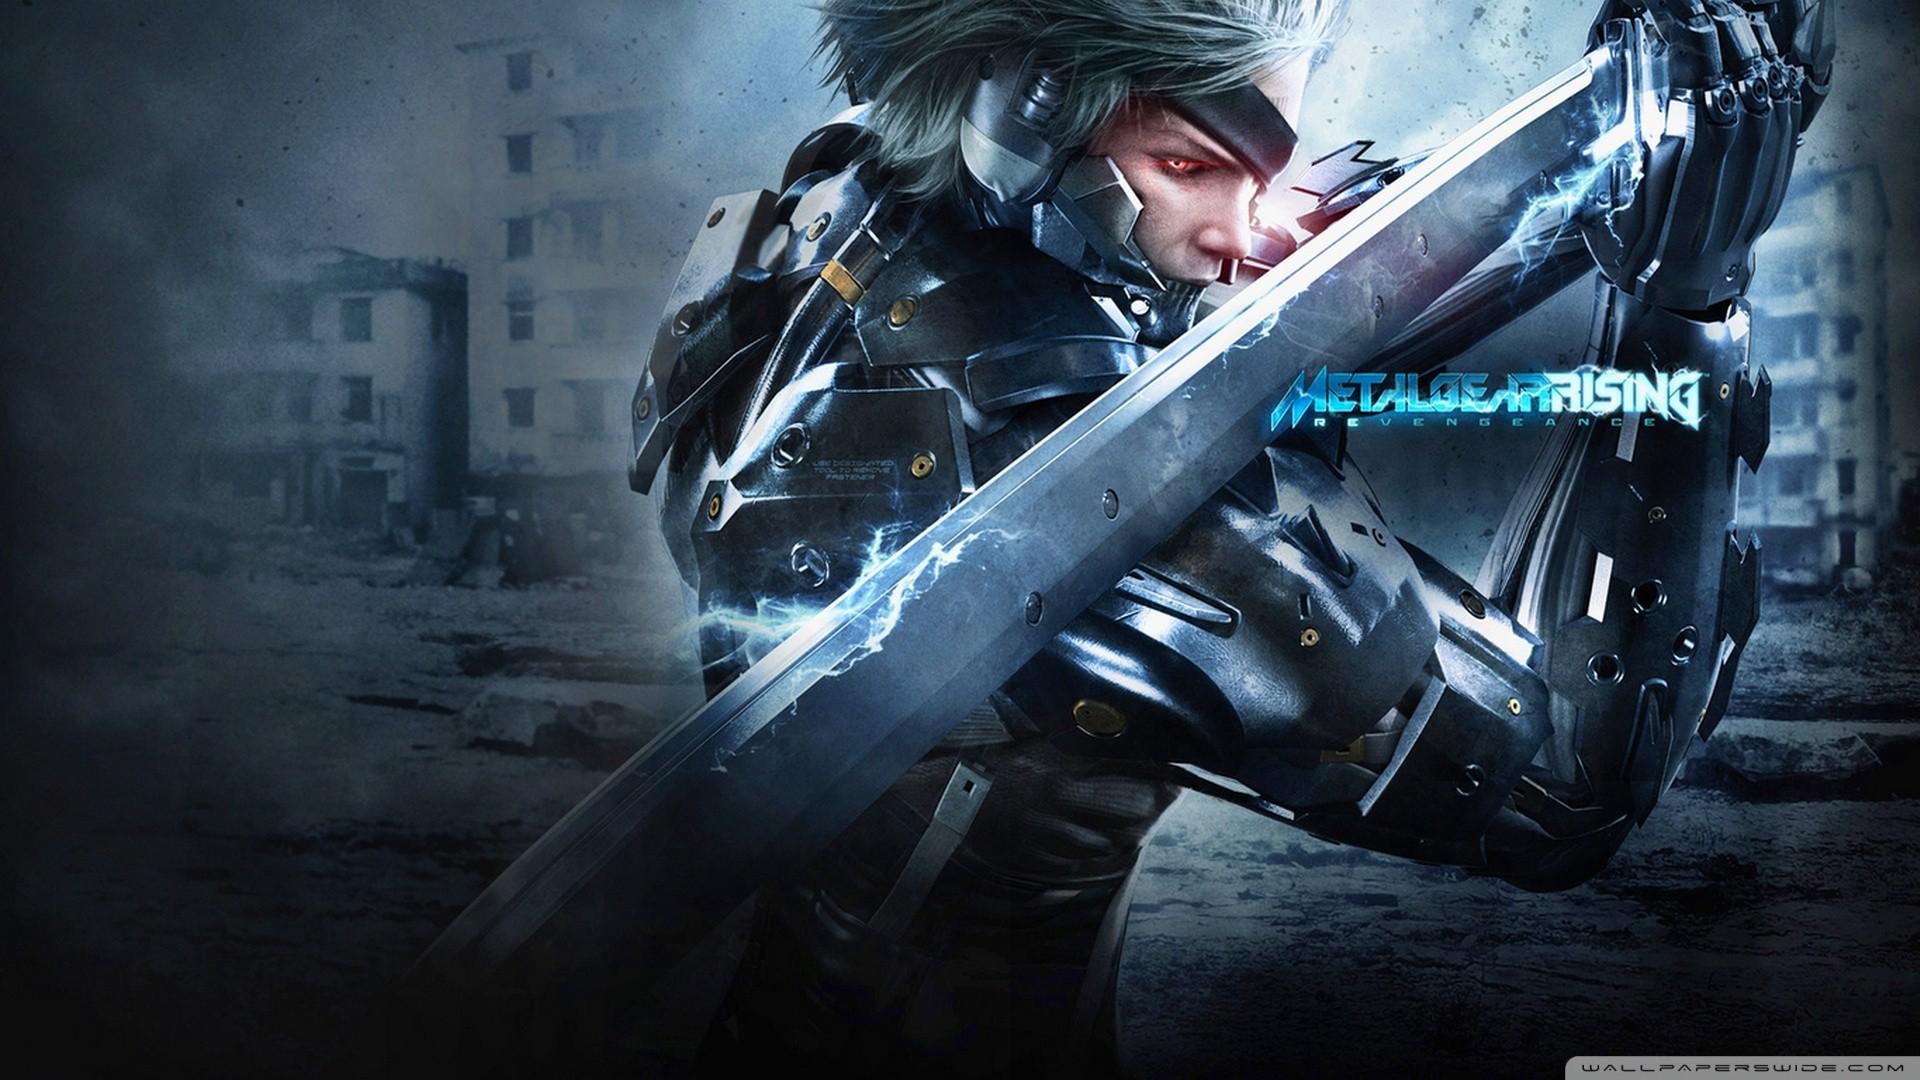 Metal Gear Solid · download Metal Gear Solid image